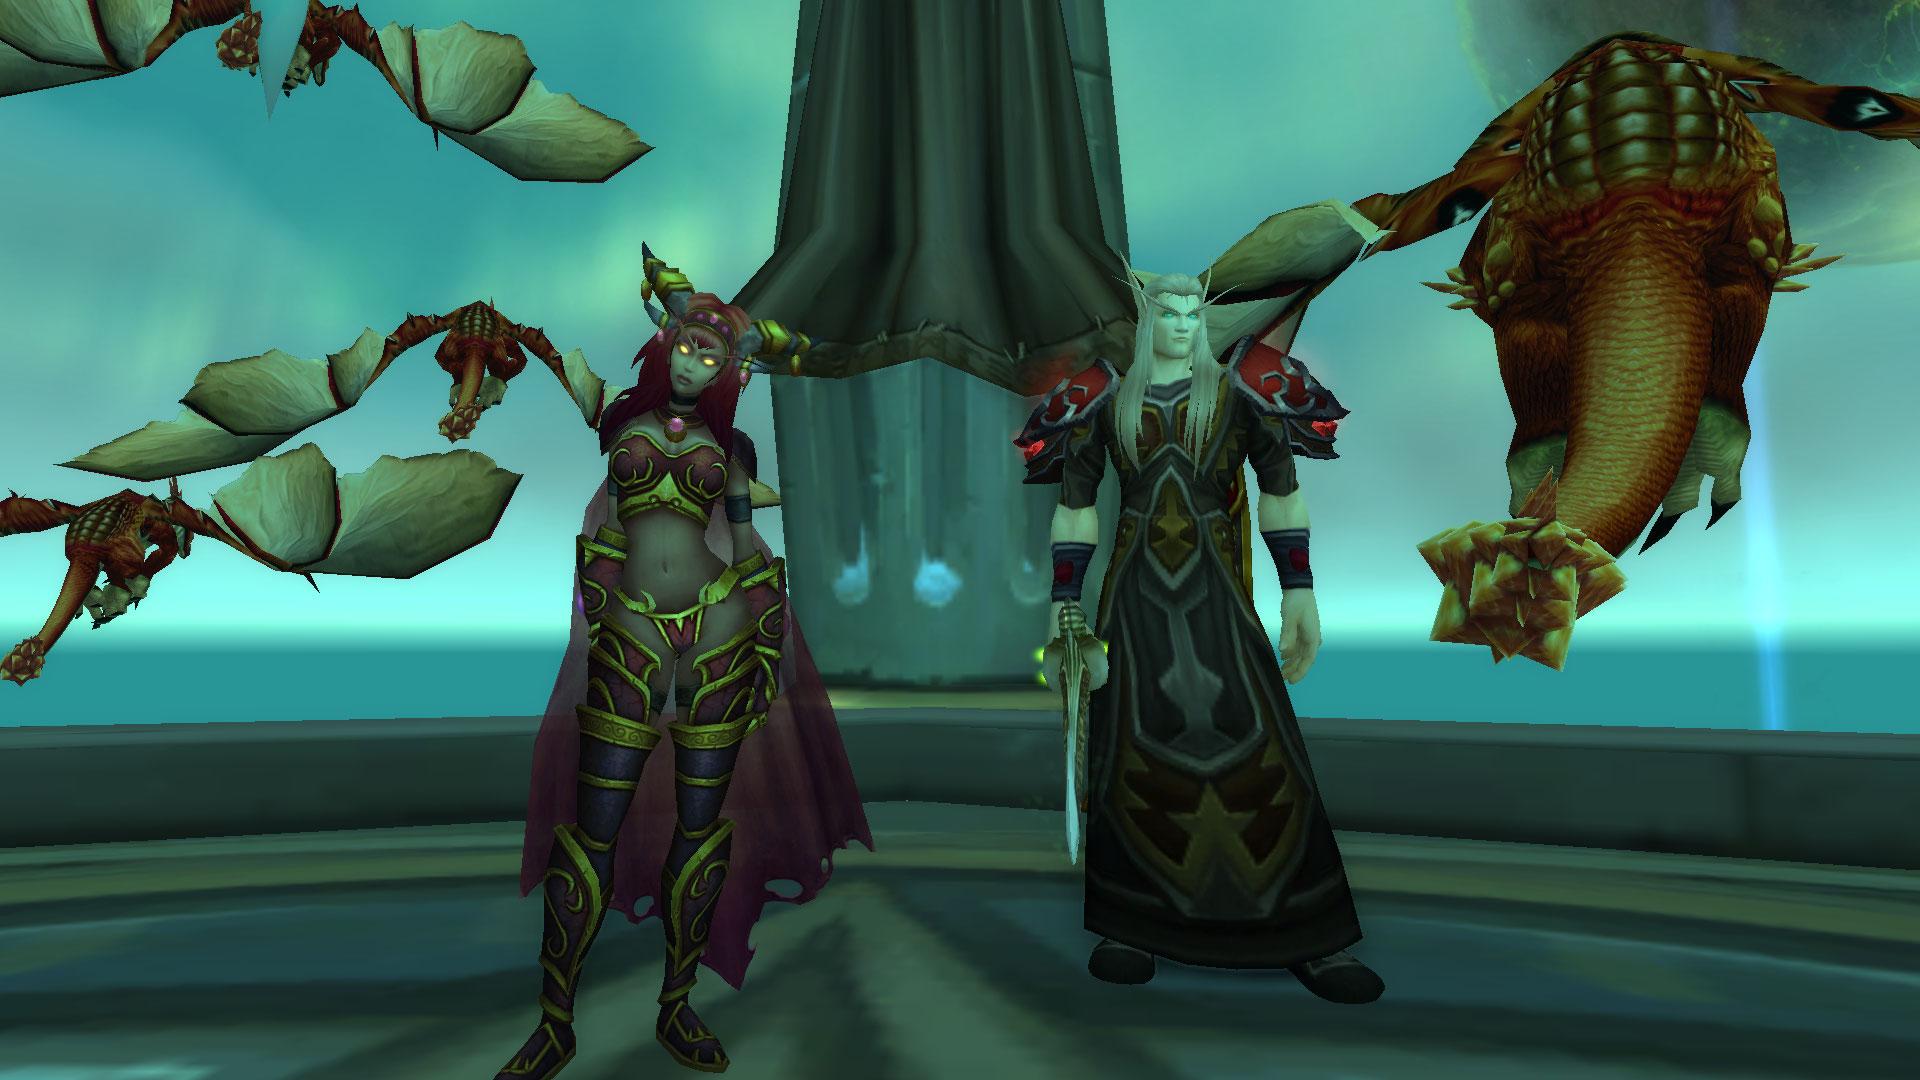 World of Warcraft Dragon Lore Krasus and Alexstrasza